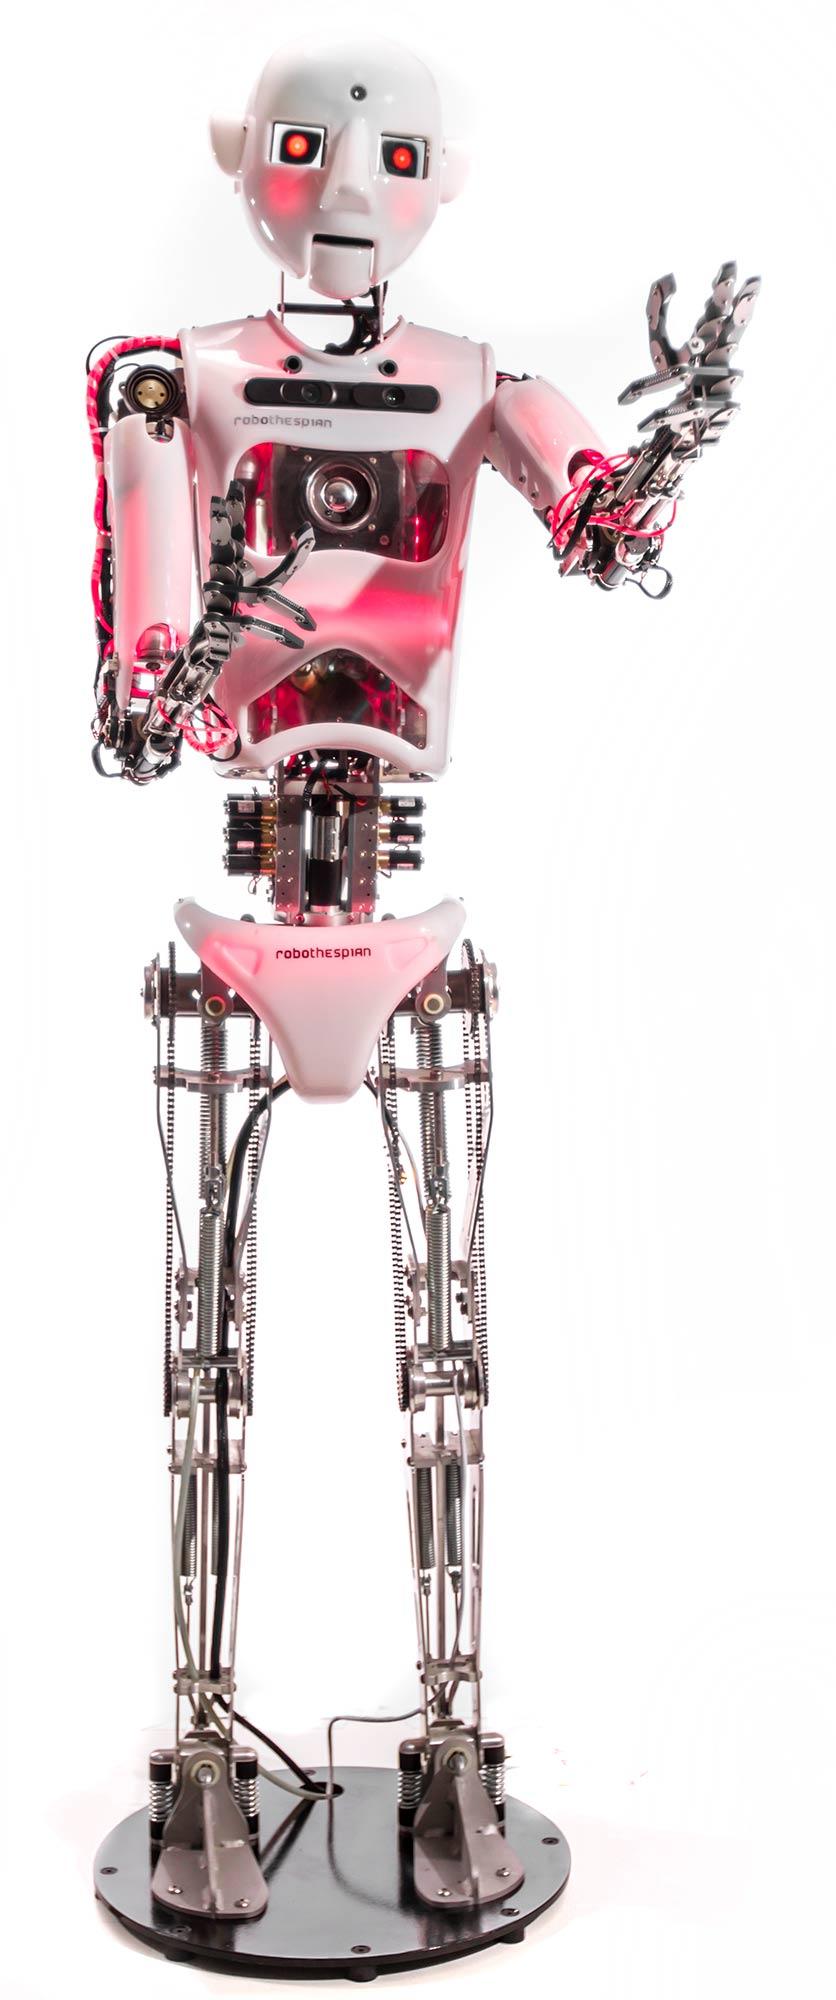 Full Size Humanoid Robot RoboThespian Robot Actor Terminator - Engineered Arts